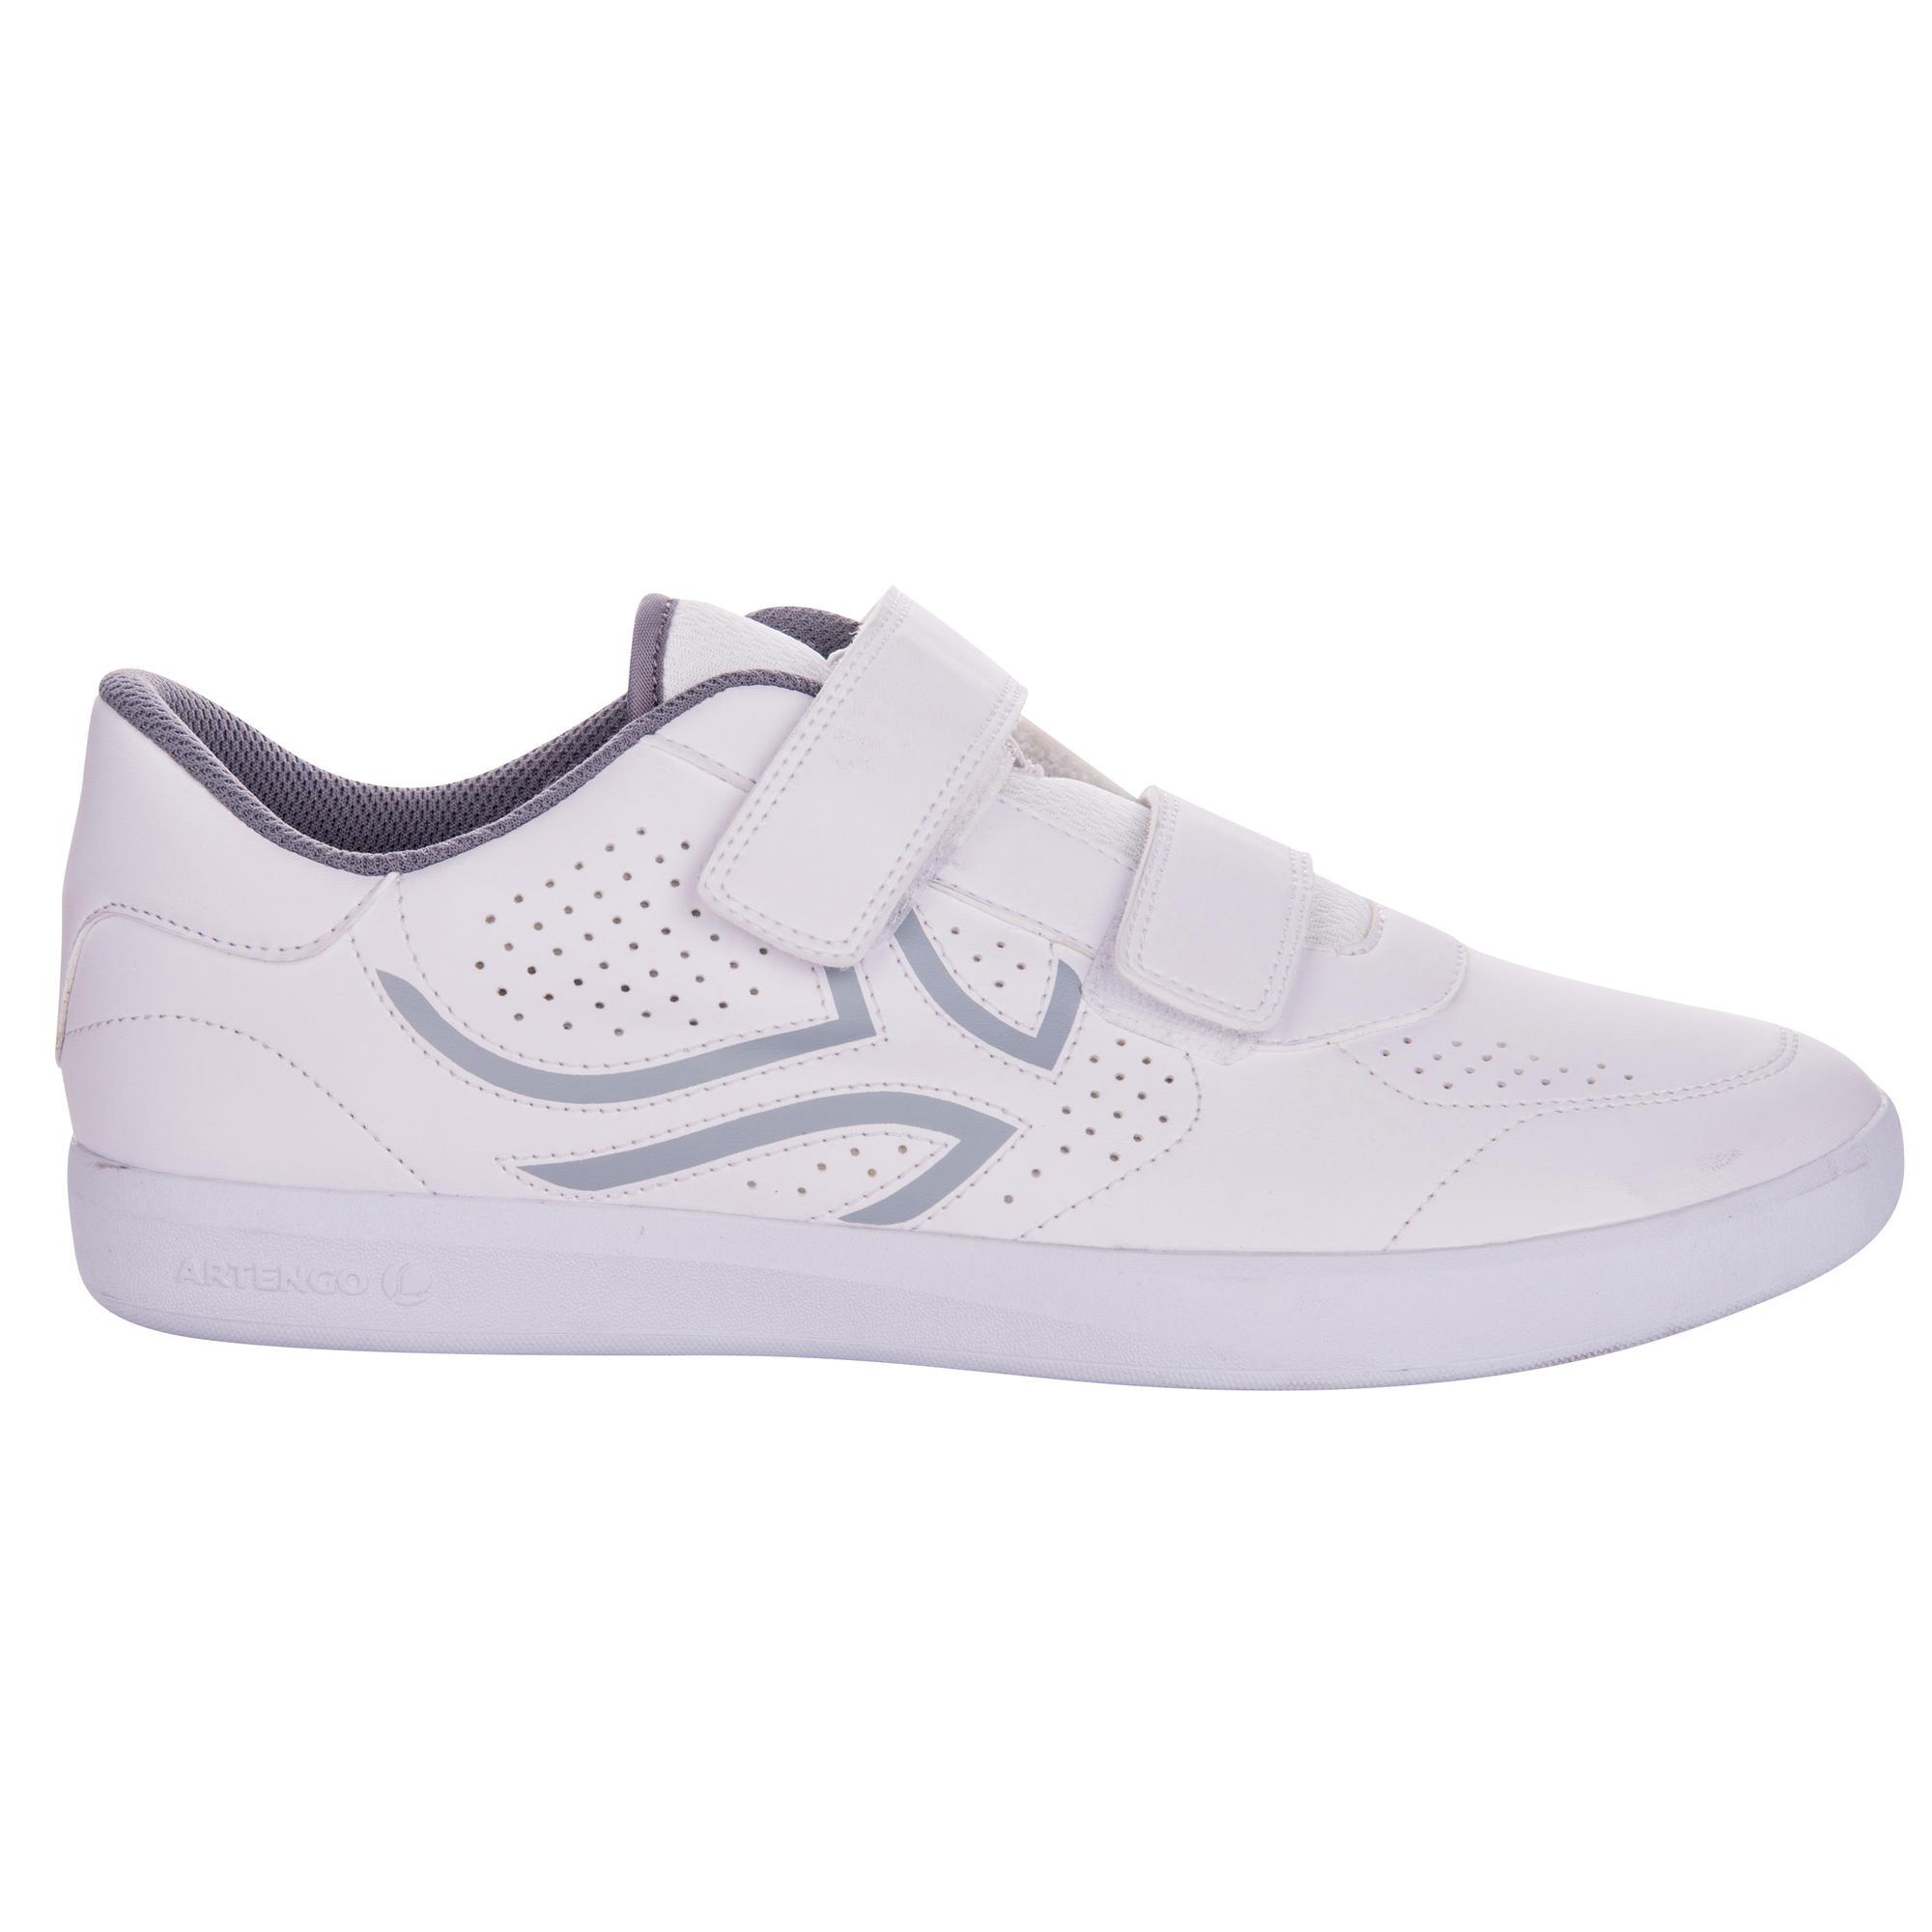 Artengo,chaussures Homme Tennis Chaussure Homme Artengo,chaussures 800 Tennis 800 Tennis Chaussure Chaussure cA6CRgg8qf